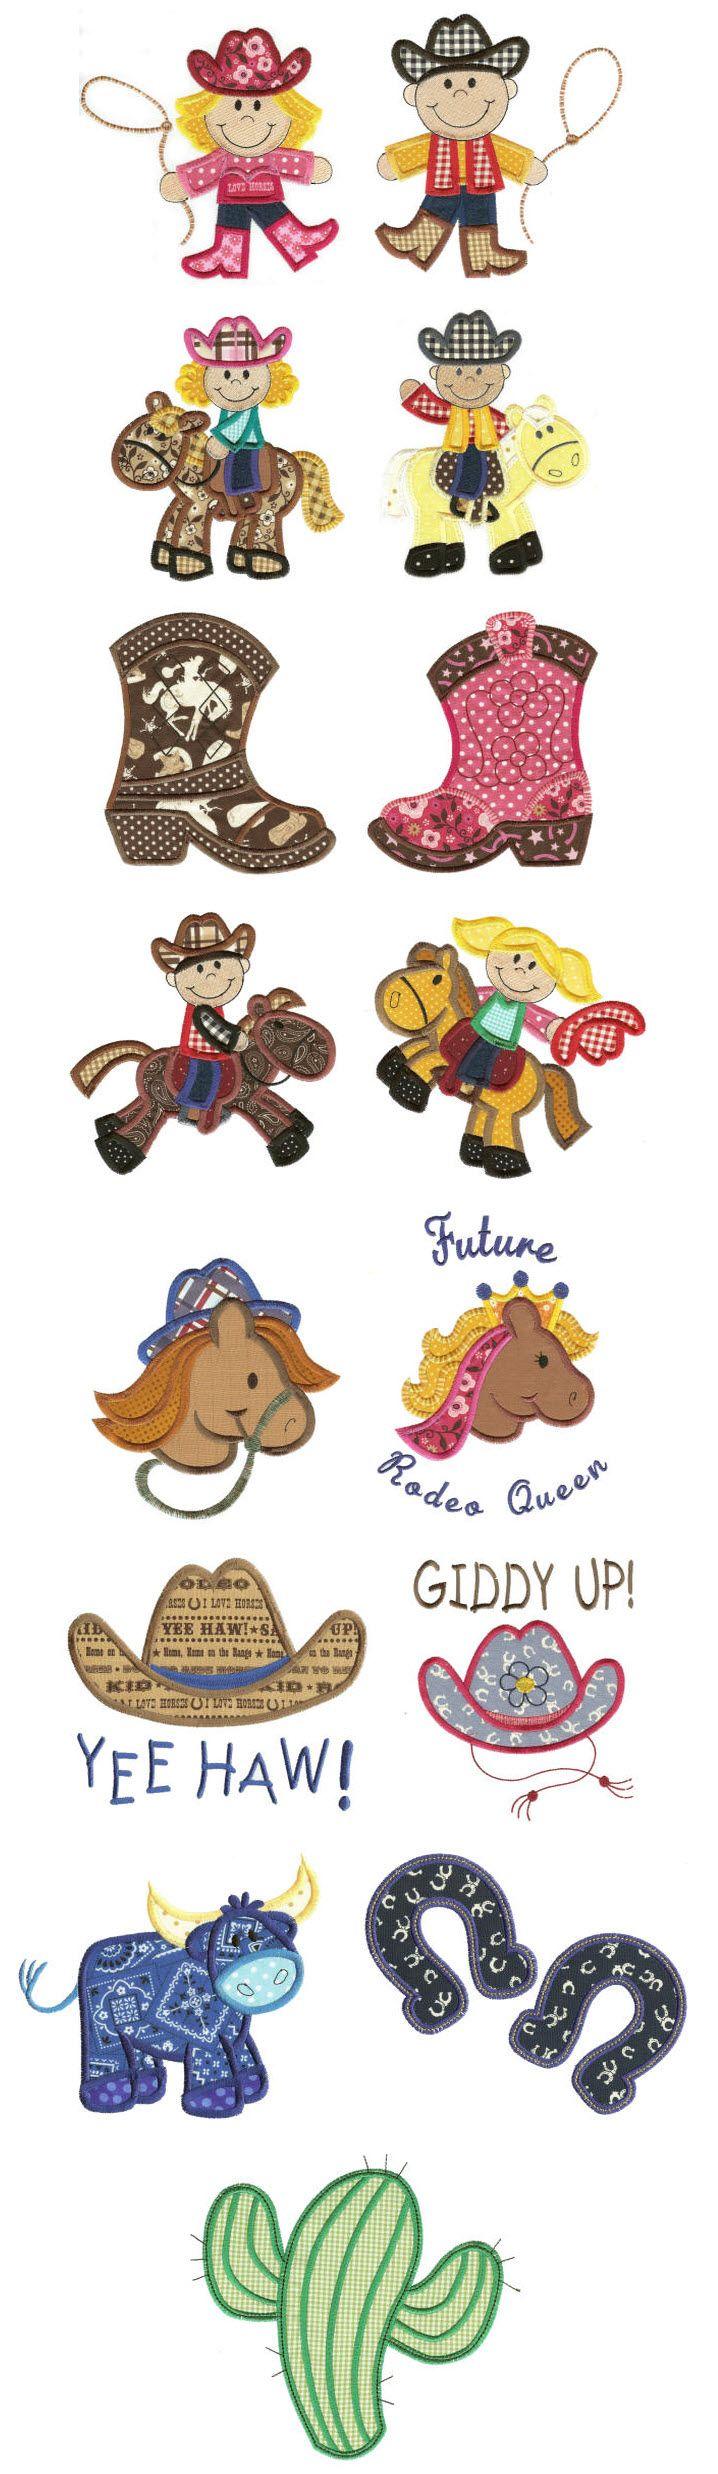 Embroidery   Free Machine Embroidery Designs   Ride Em Cowboy Applique